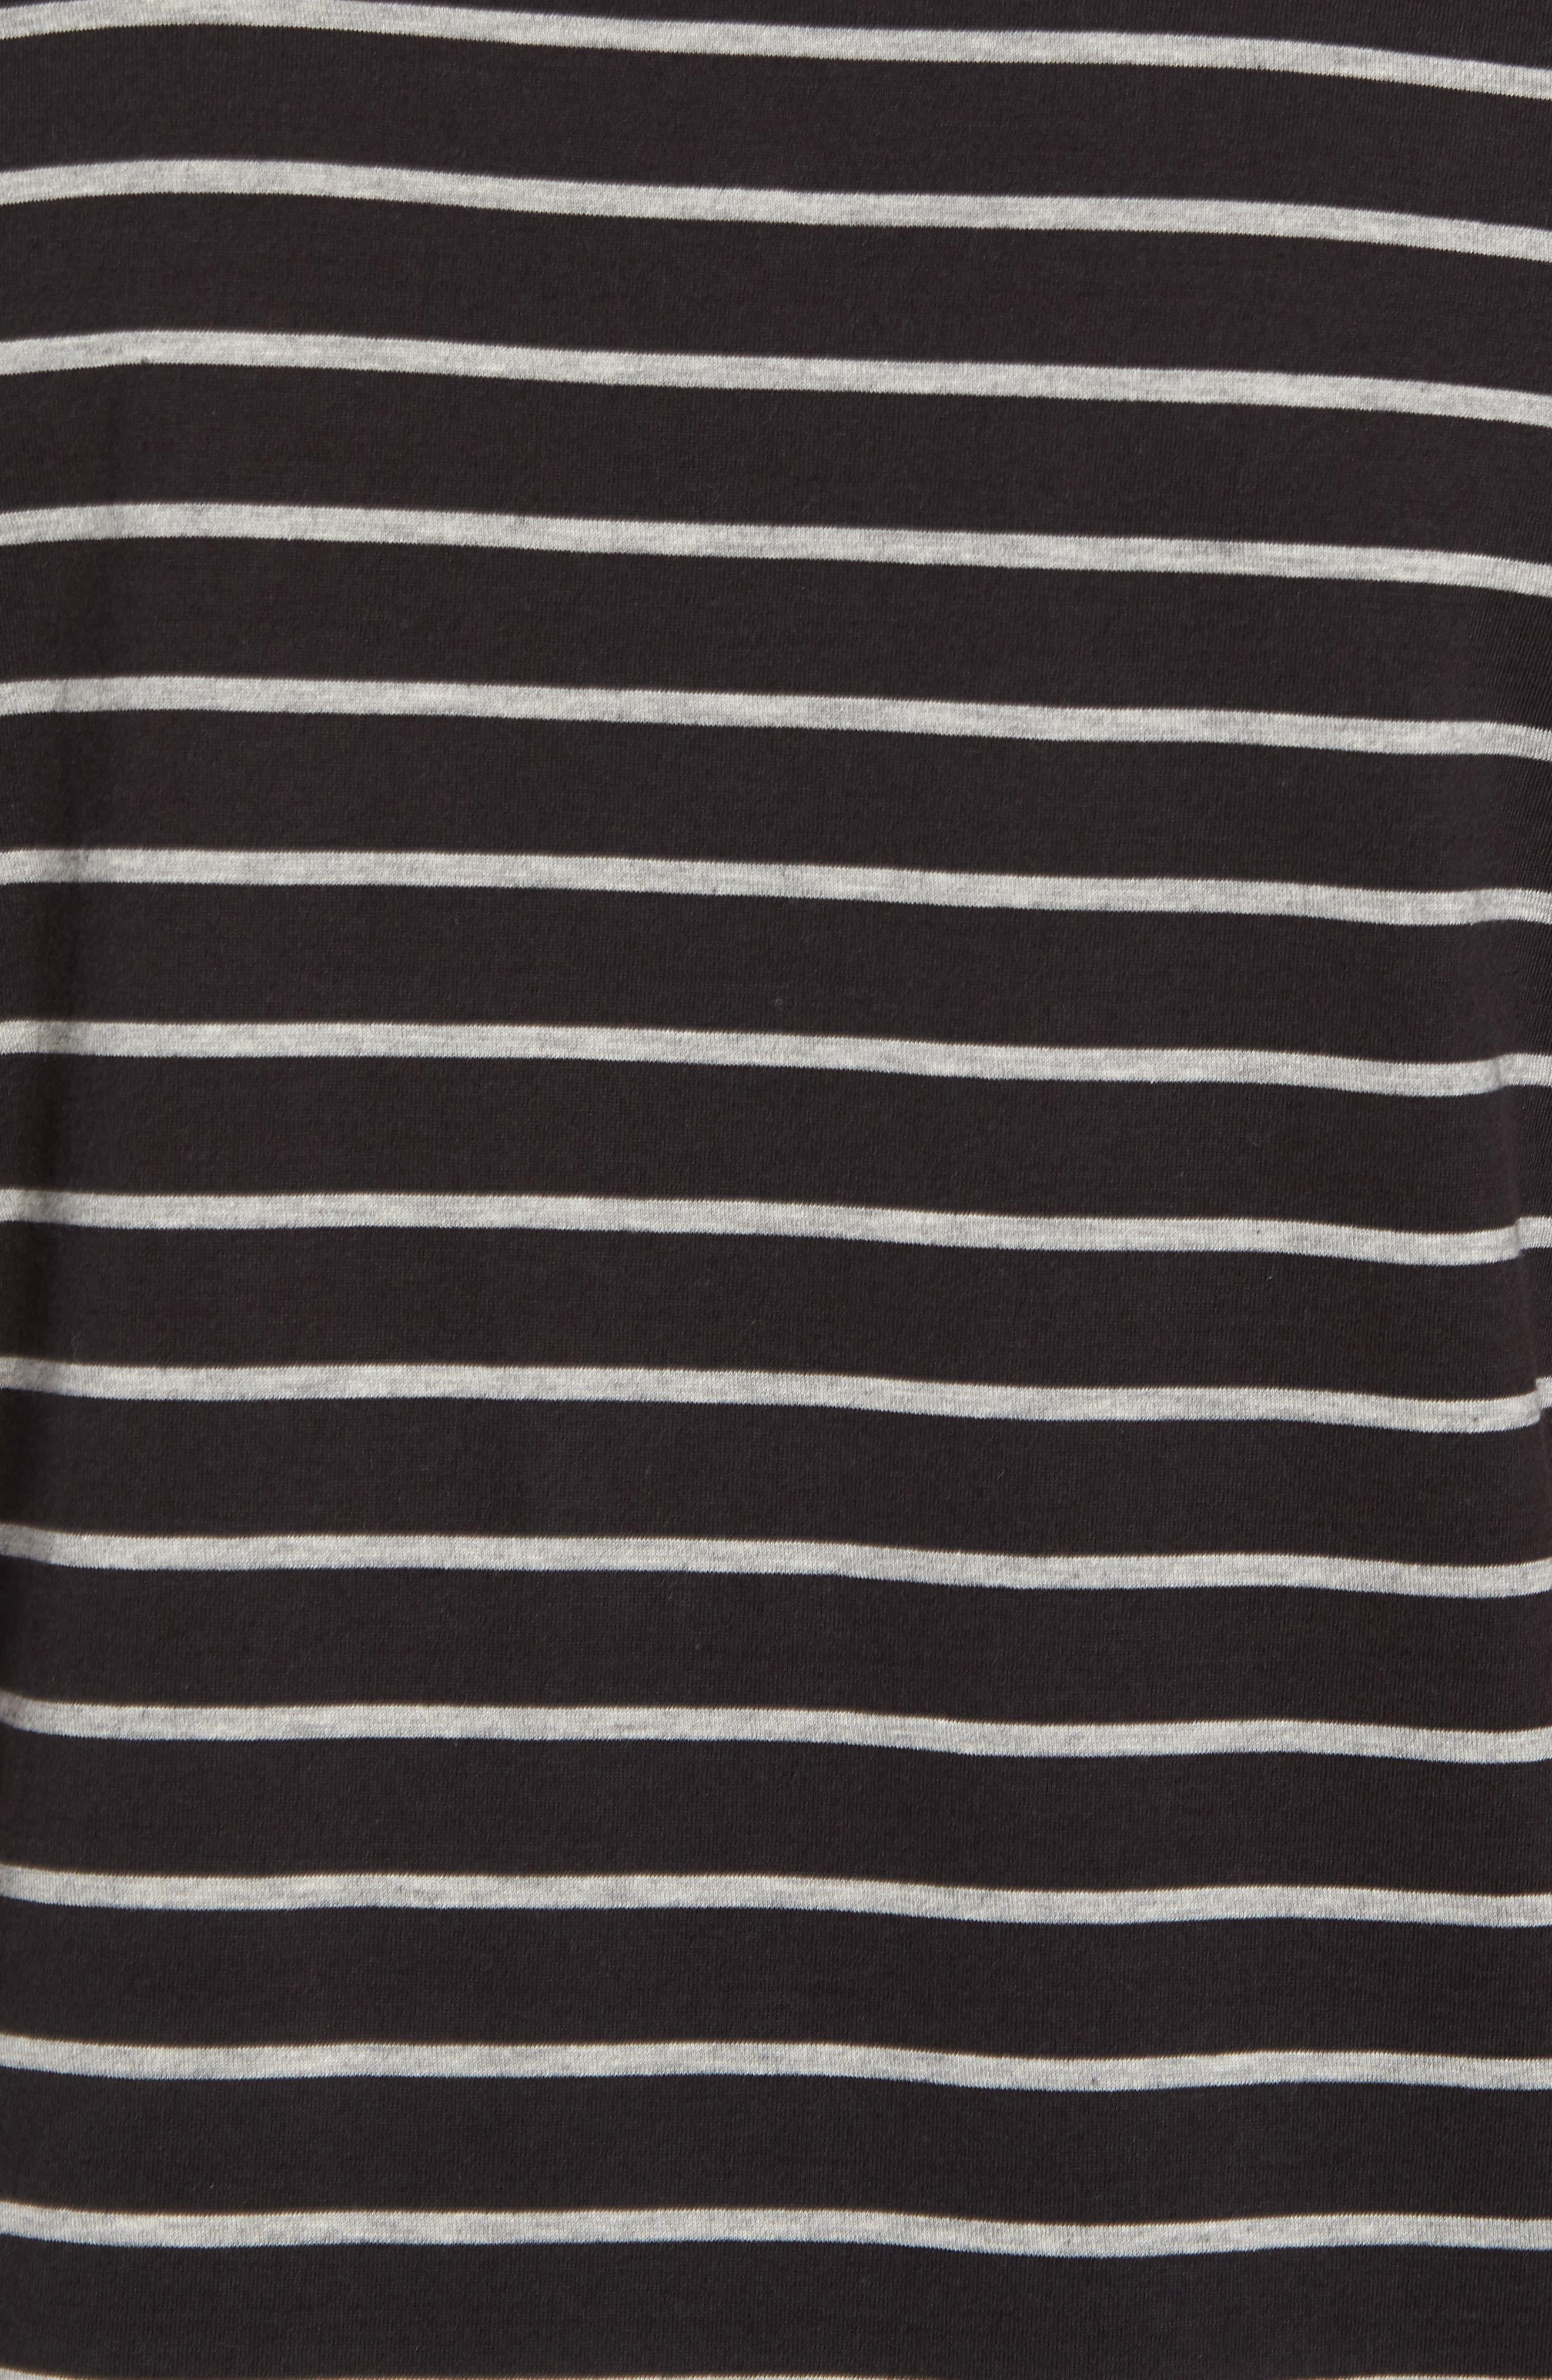 Slim Fit Heathered Stripe T-Shirt,                             Alternate thumbnail 5, color,                             Black/ Heather Steel